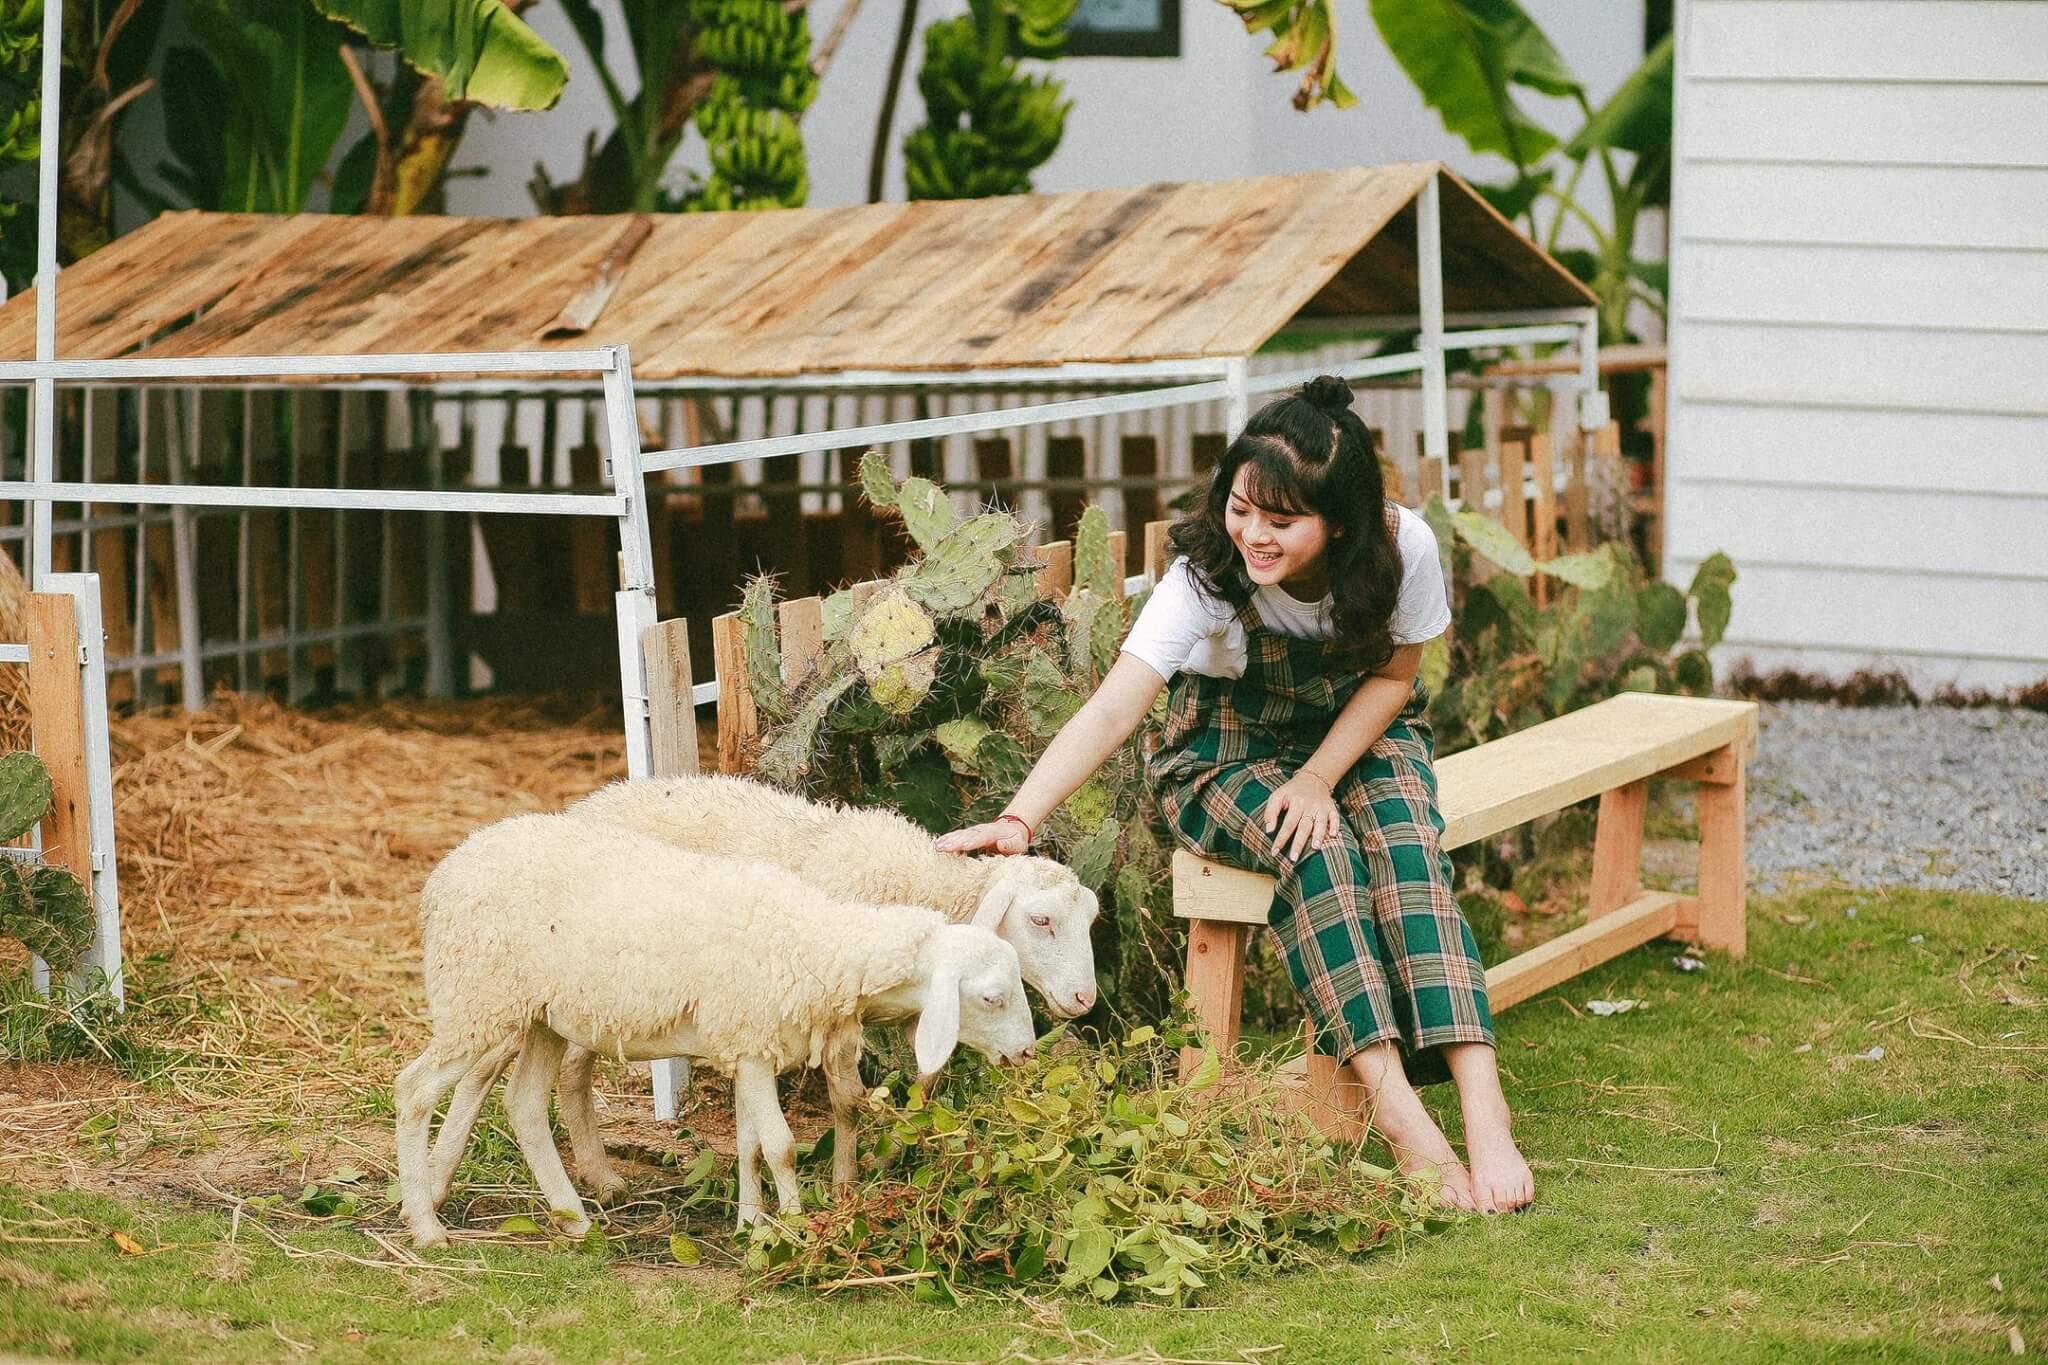 Dream House Phim Truong Moi Toanh Tai Da Nang Fantasticity Com 08